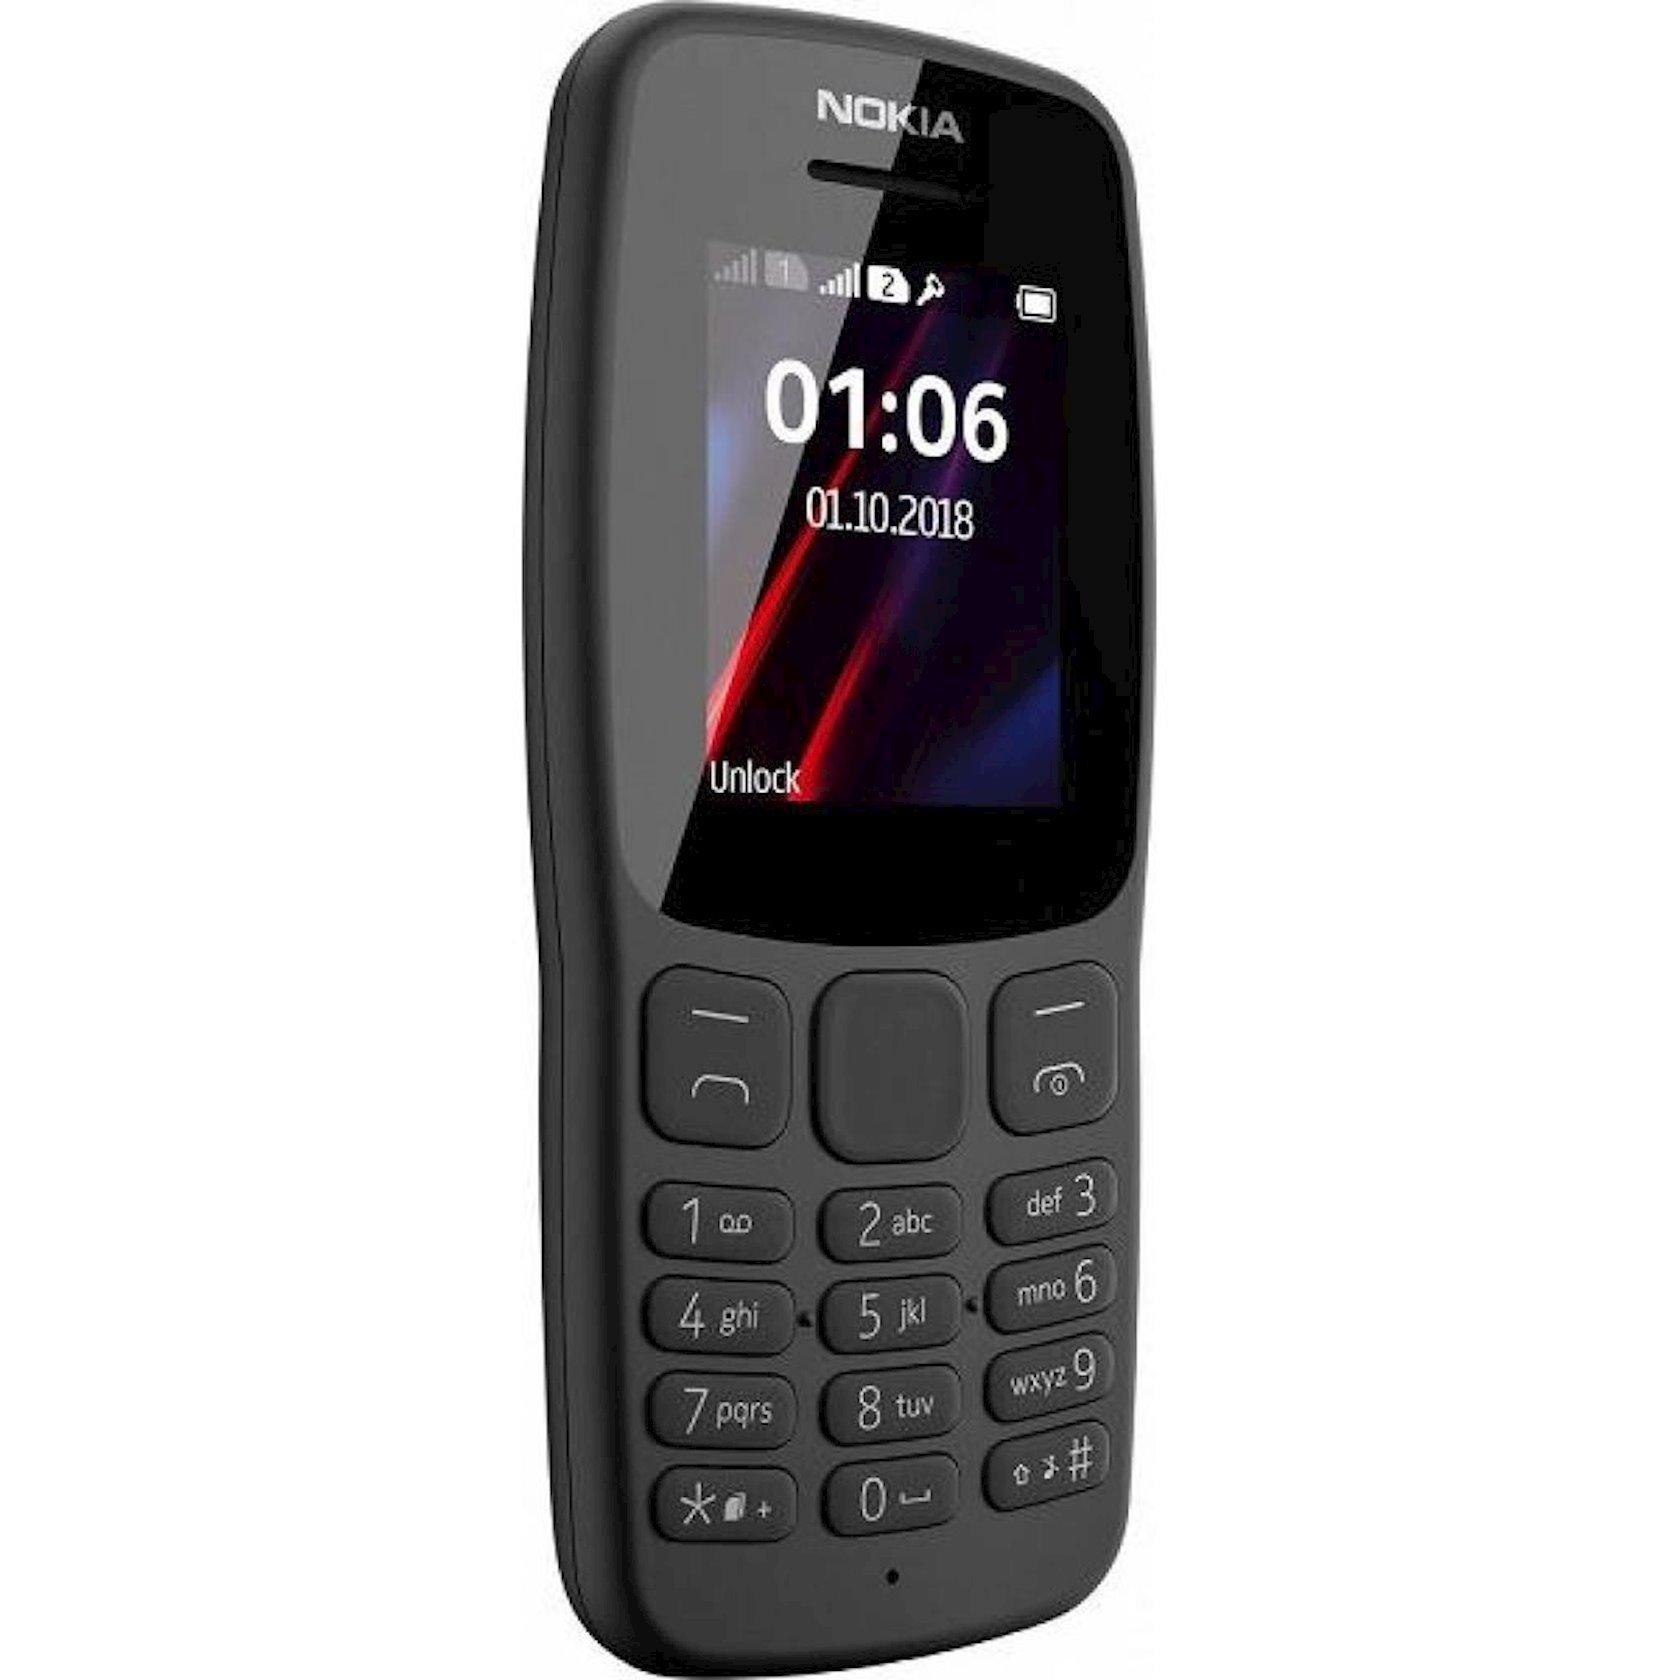 Mobil telefon Nokia 106 DS 2018 Grey